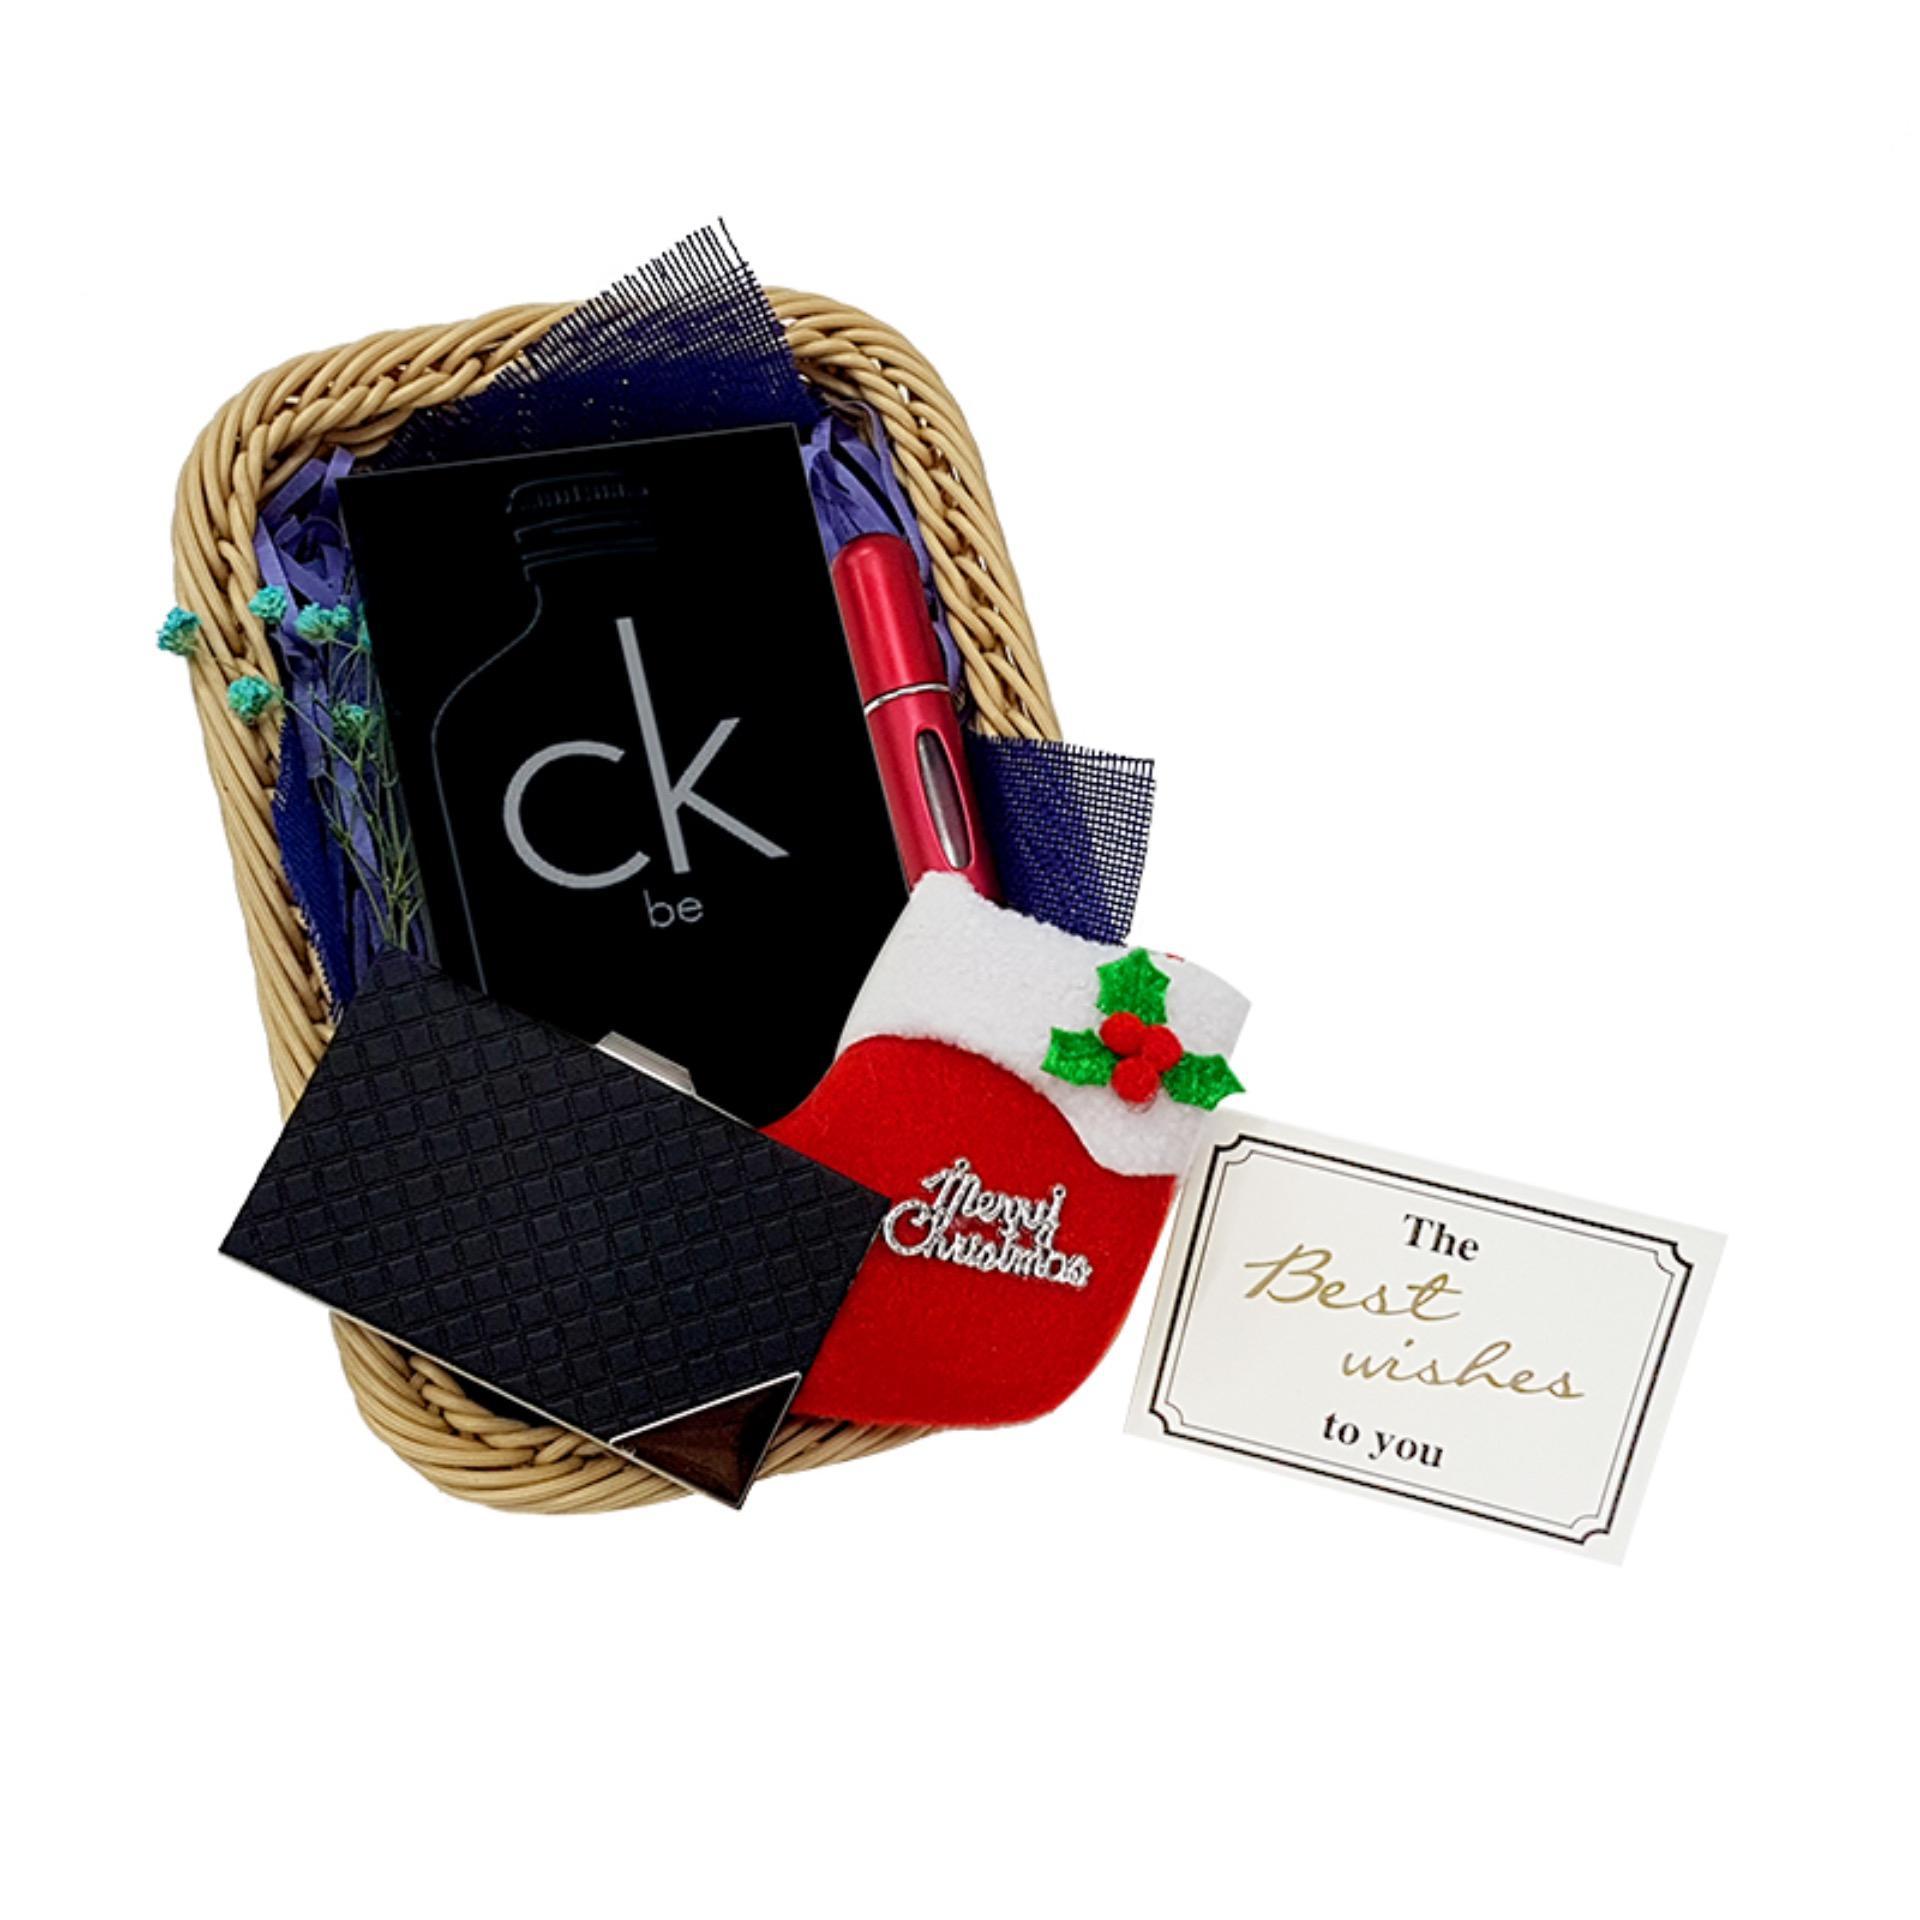 Buy Calvin Klein Ck Be Edt Unisex 200ml Premium Gift Set Singapore